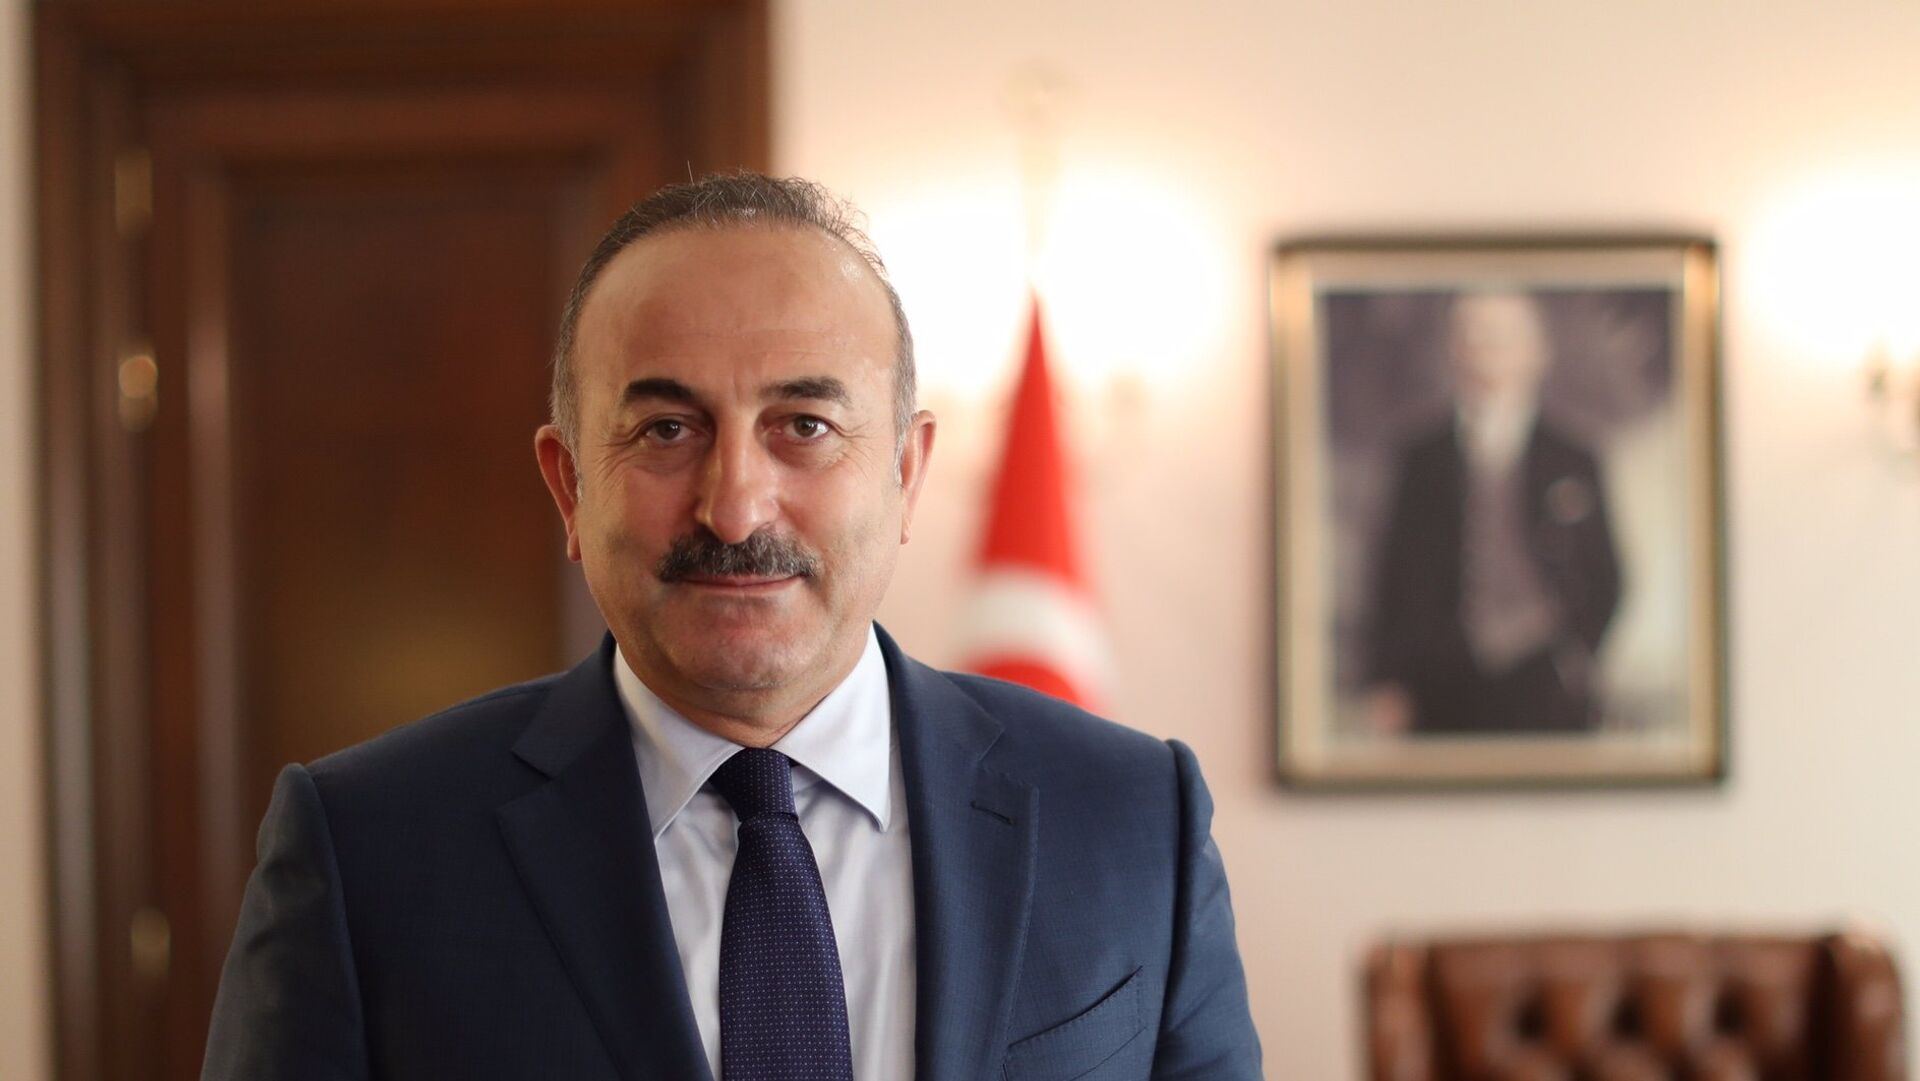 Mevlut Cavusoglu, el ministro de Exteriores de Turquía - Sputnik Mundo, 1920, 24.08.2021